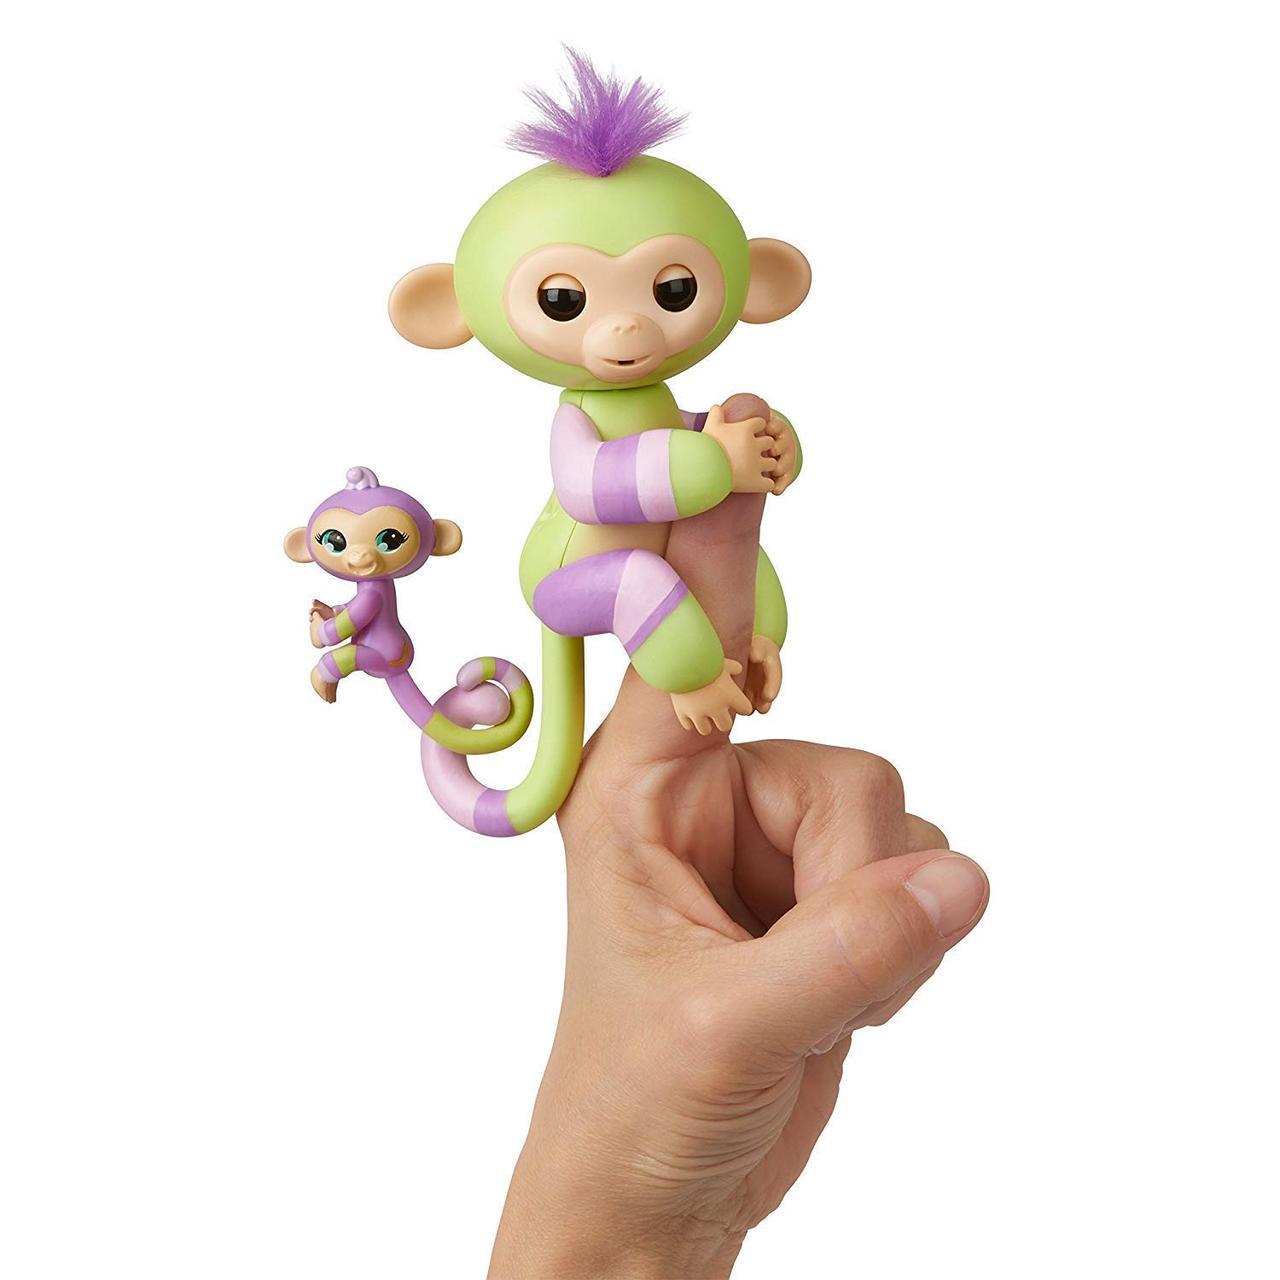 Интерактивная ручная обезьянка мама и малыш Джесс и Иден, WowWee Fingerlings Baby Monkey & Mini BFFs